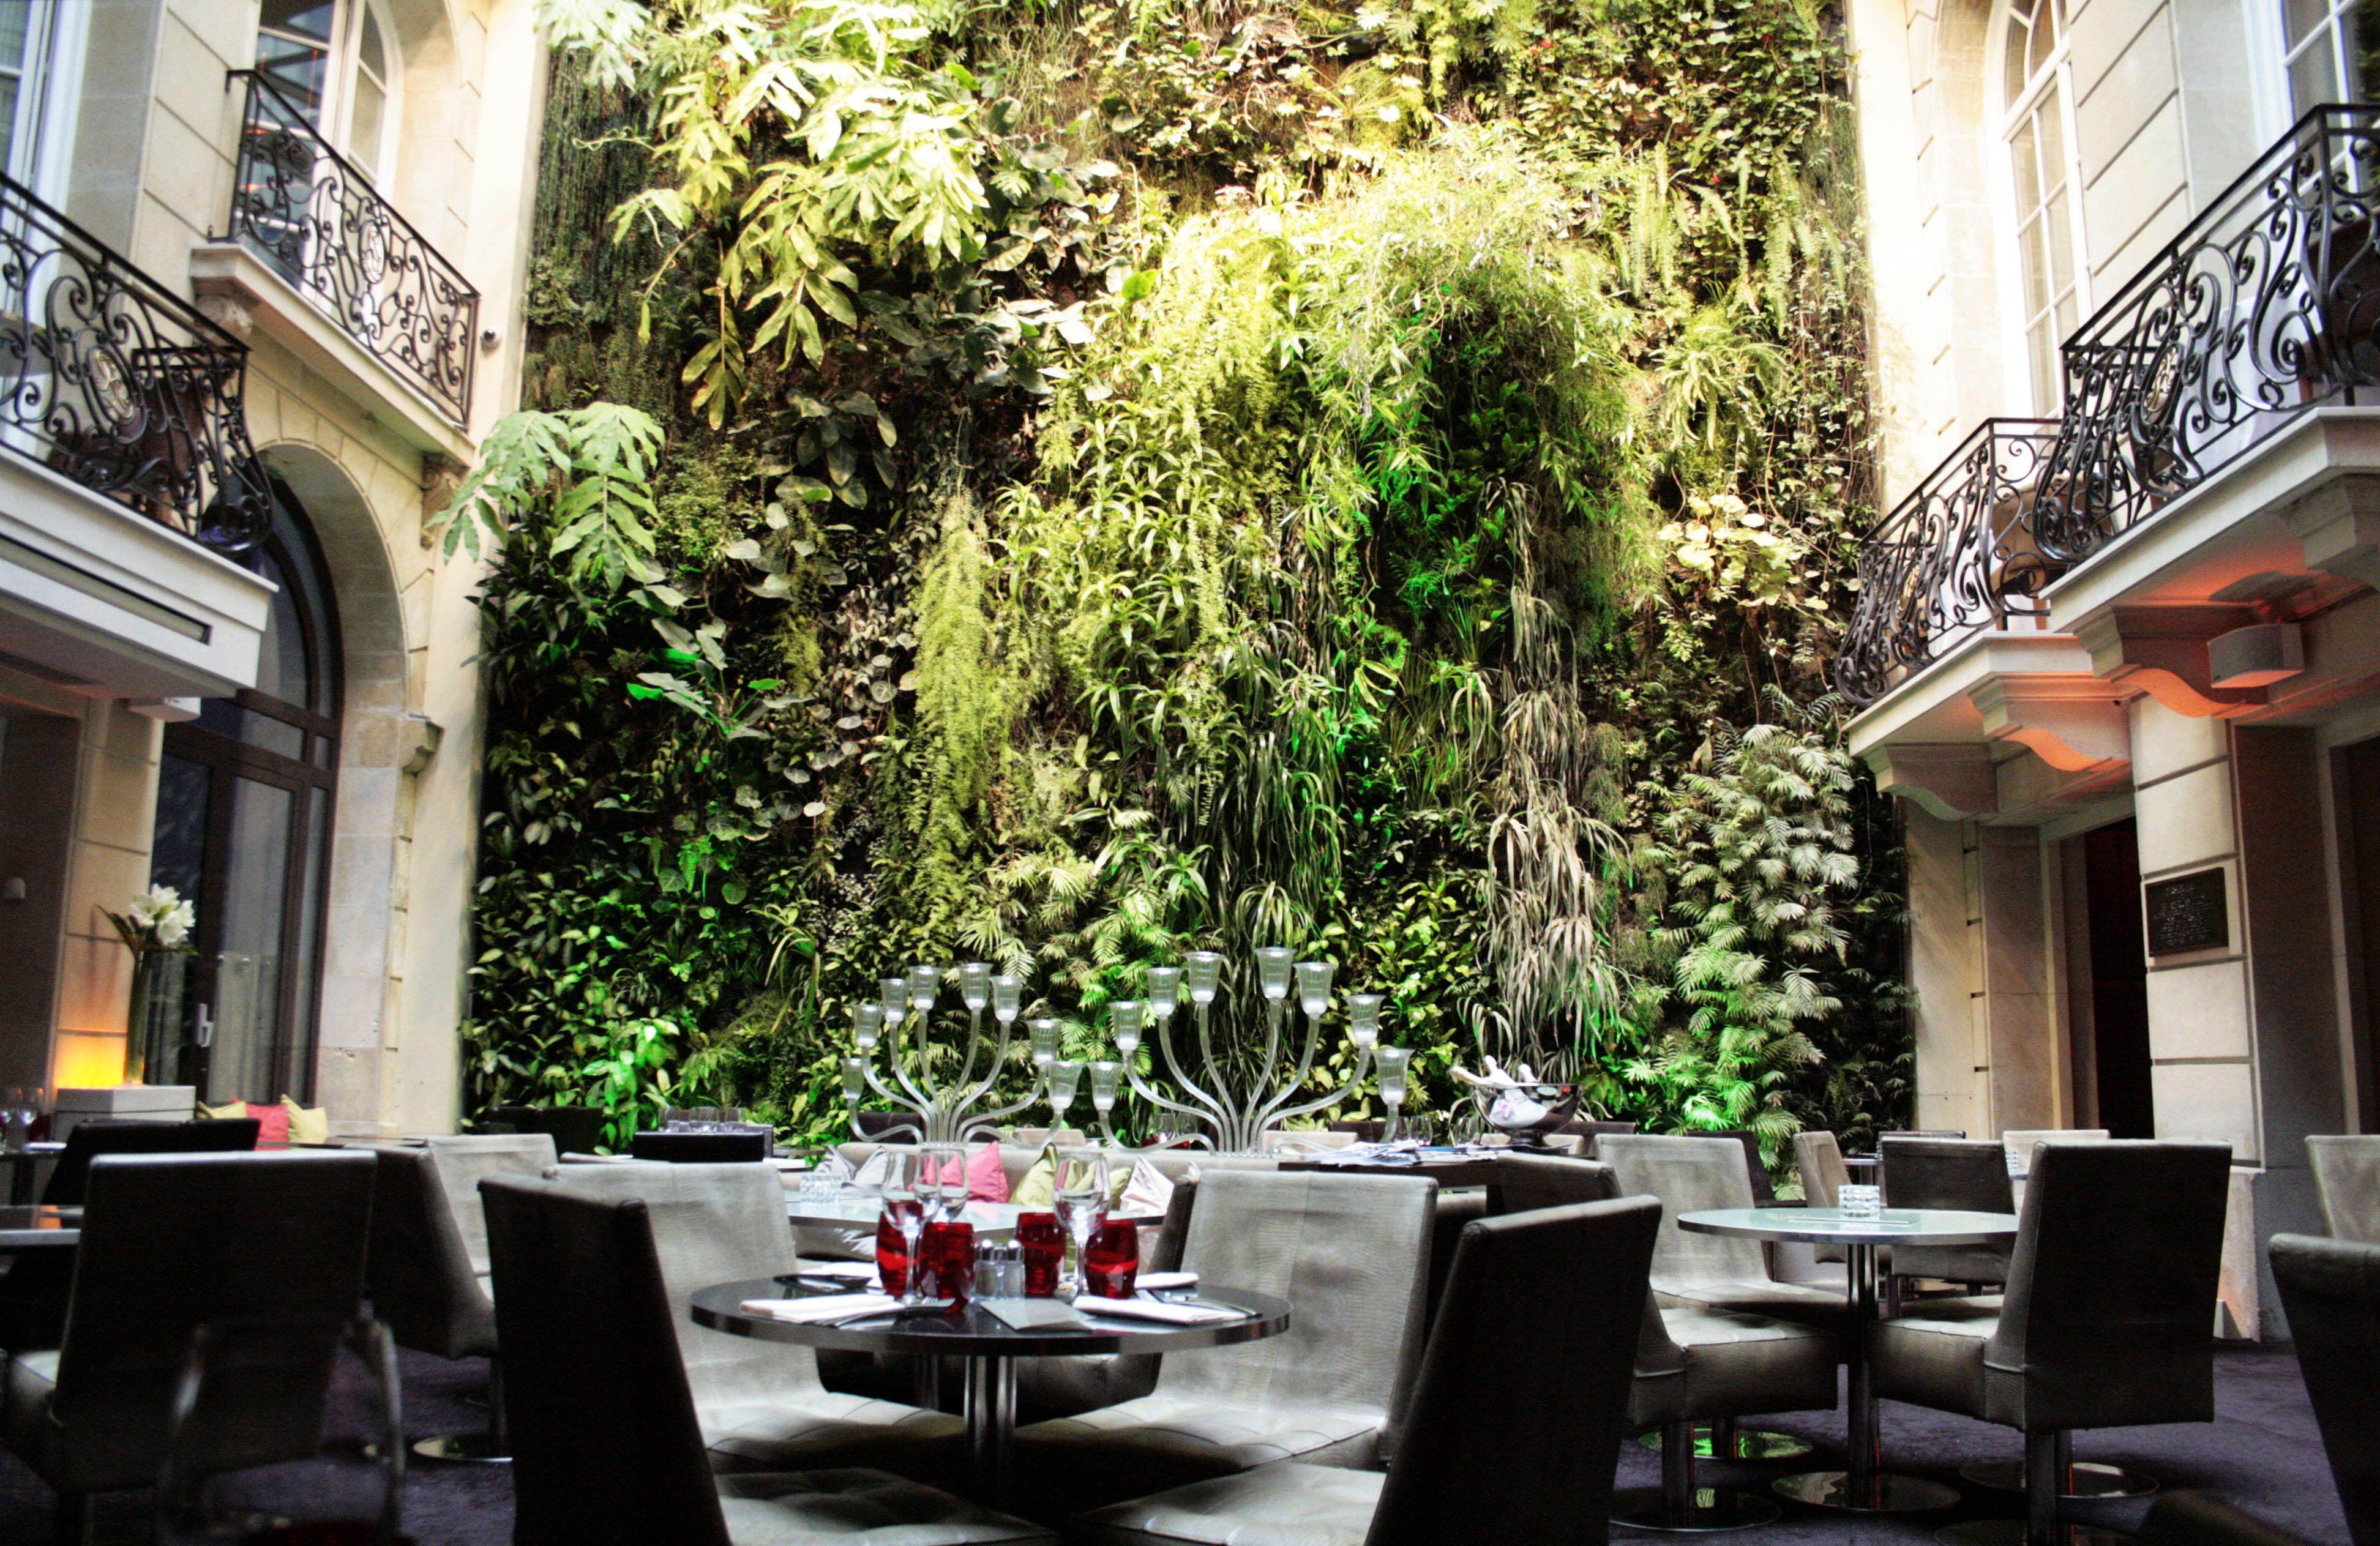 Restaurant Avec Mur Vegetal Paris